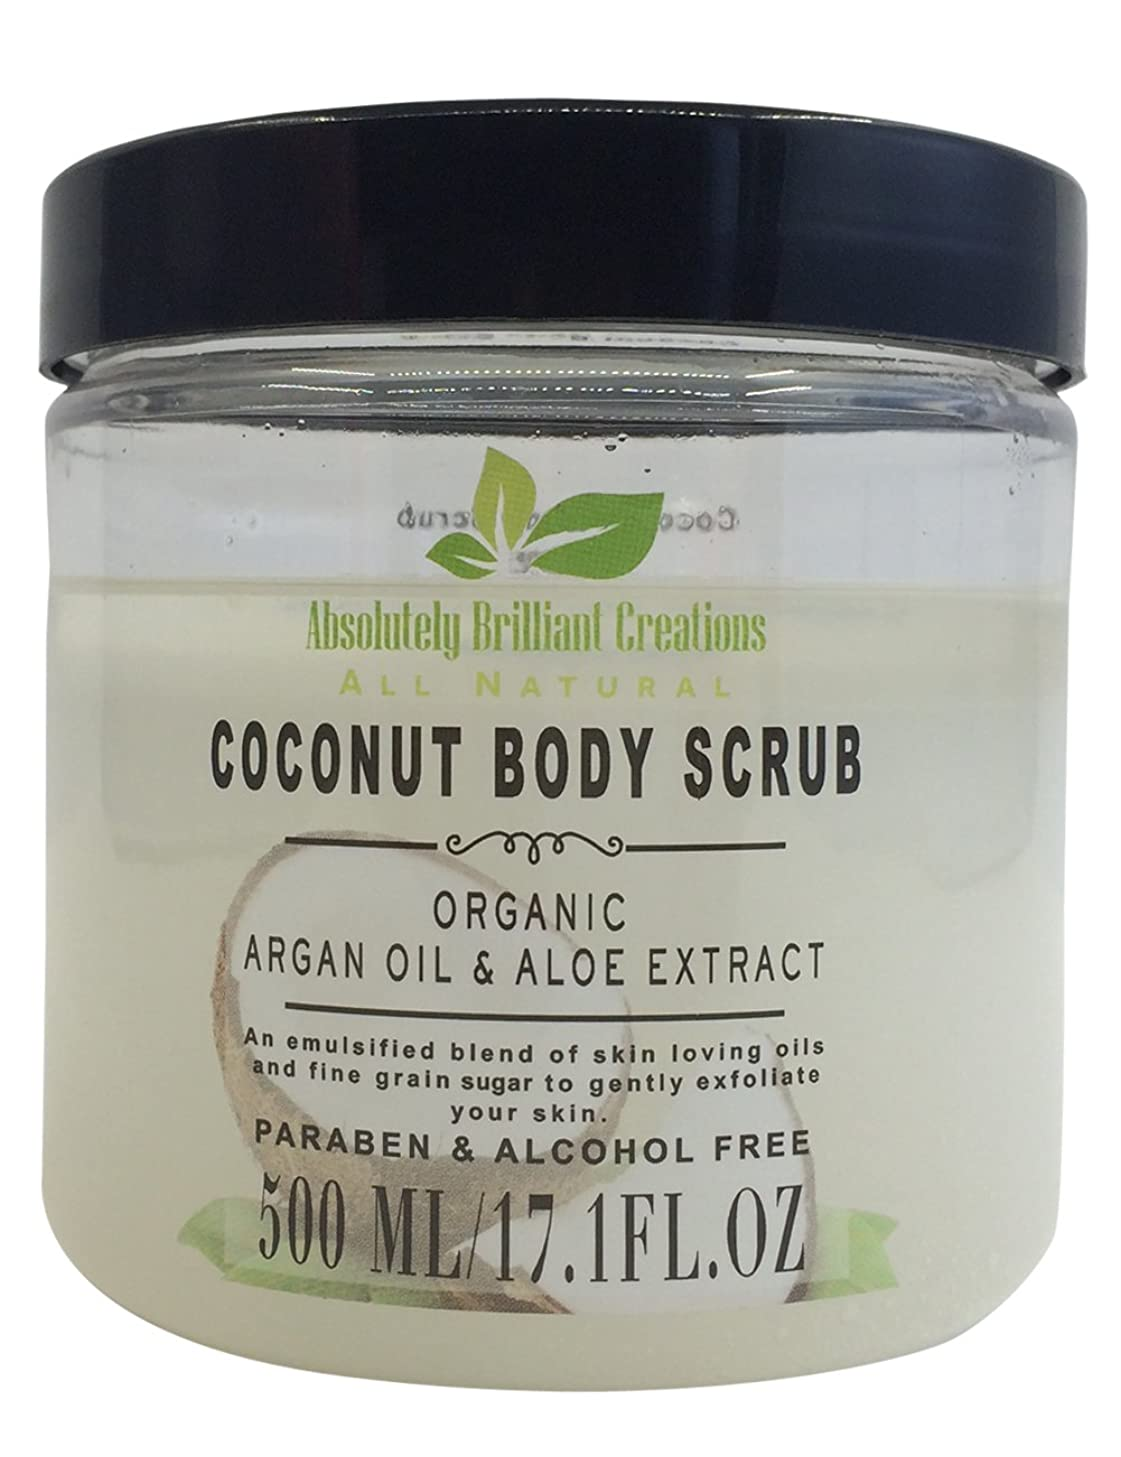 Sugar Body Scrub with Coconut Oil, Argan Oil & Aloe - All Natural Scrub to Exfoliate & Moisturize Skin - Alcohol & Paraben Free, 500 mL